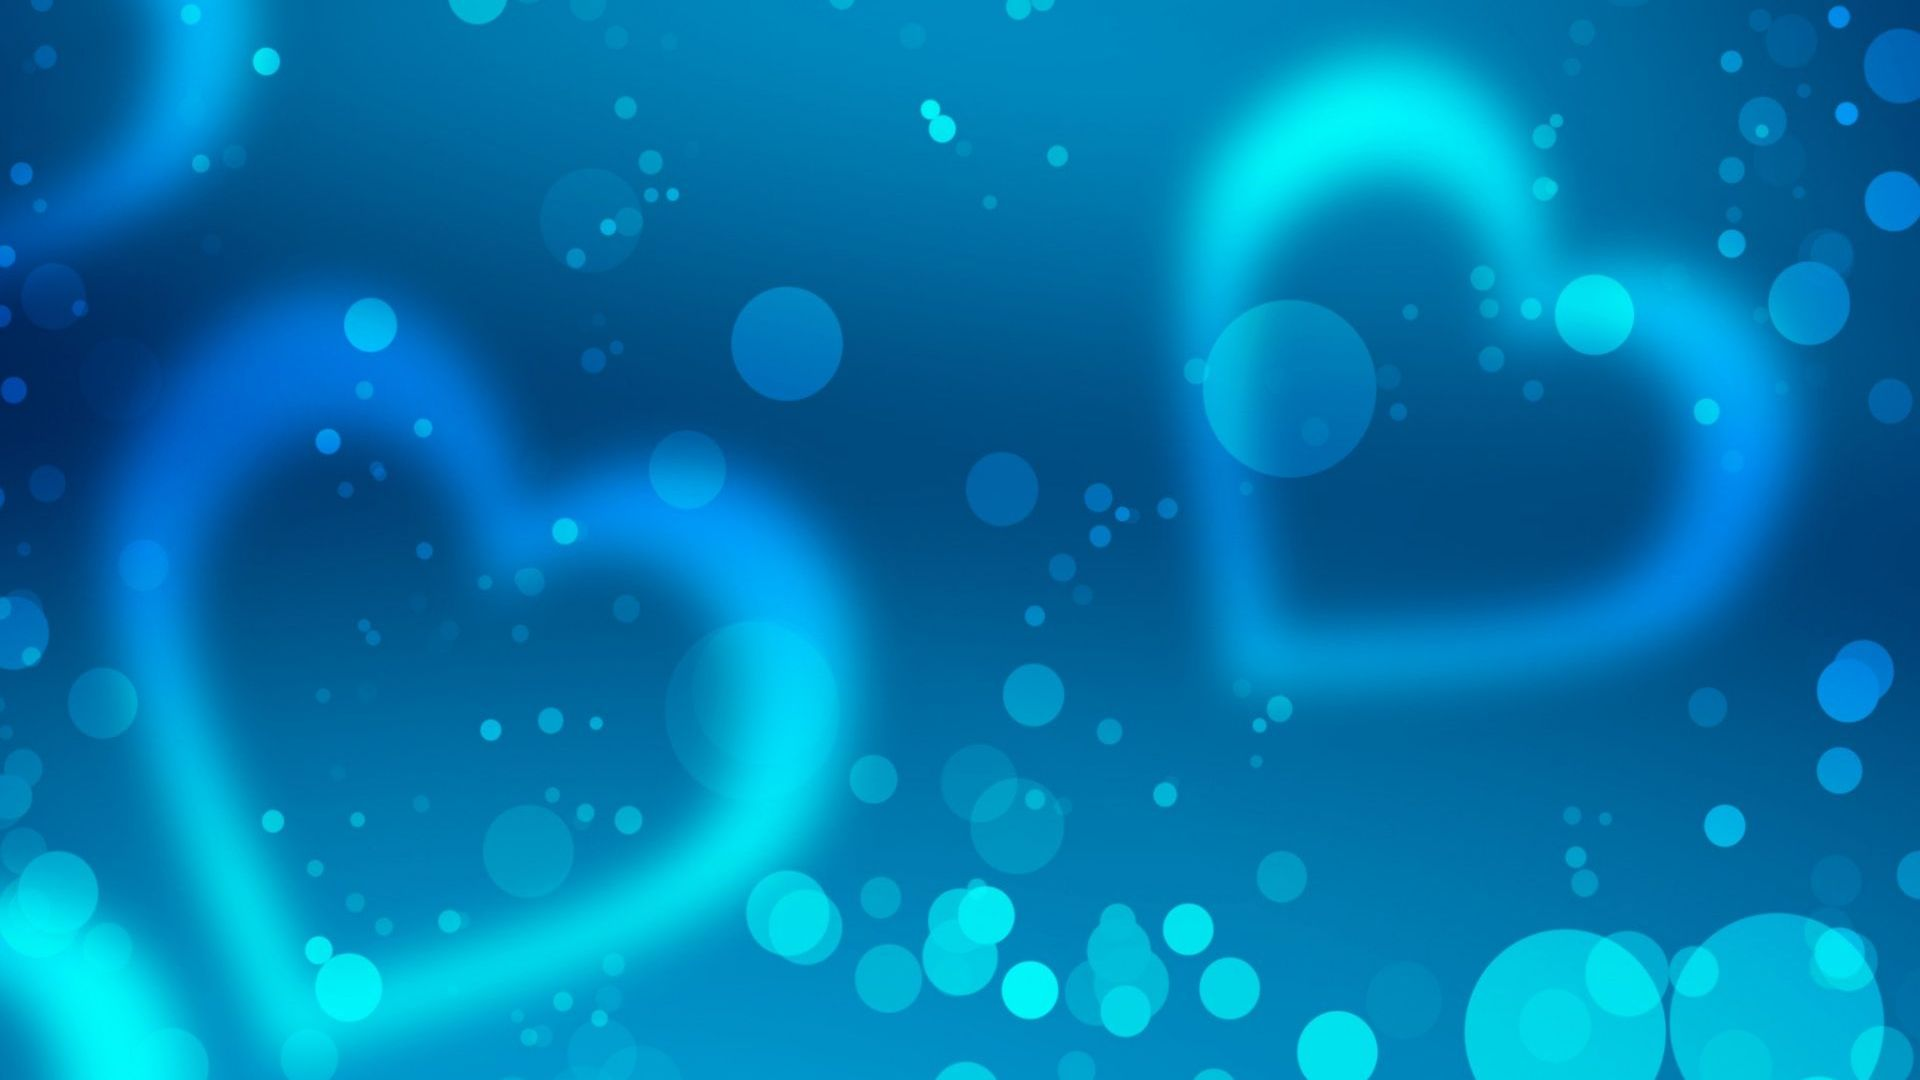 hd hintergrundbilder herzen romantik glitter blau desktop. Black Bedroom Furniture Sets. Home Design Ideas